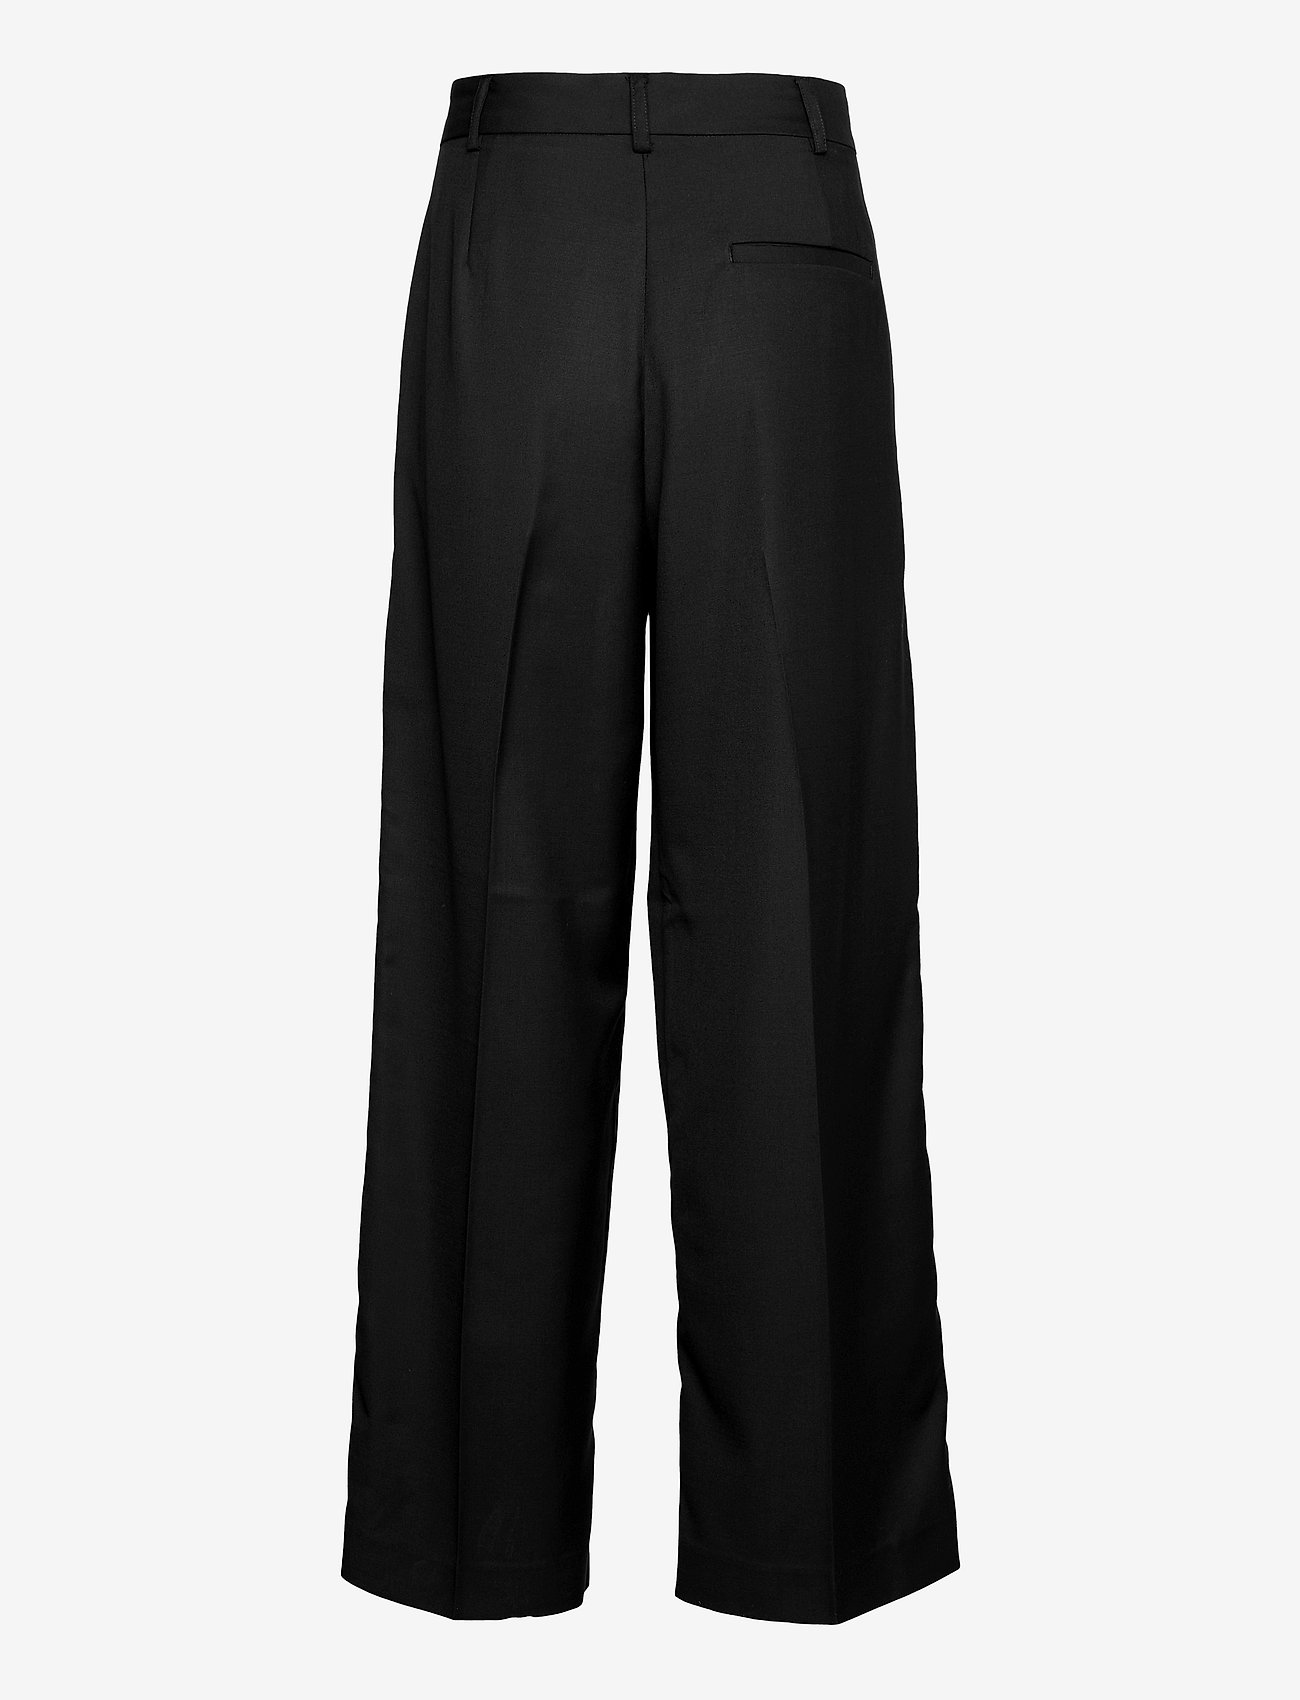 By Malene Birger - CYMBARIA - bukser med brede ben - black - 1